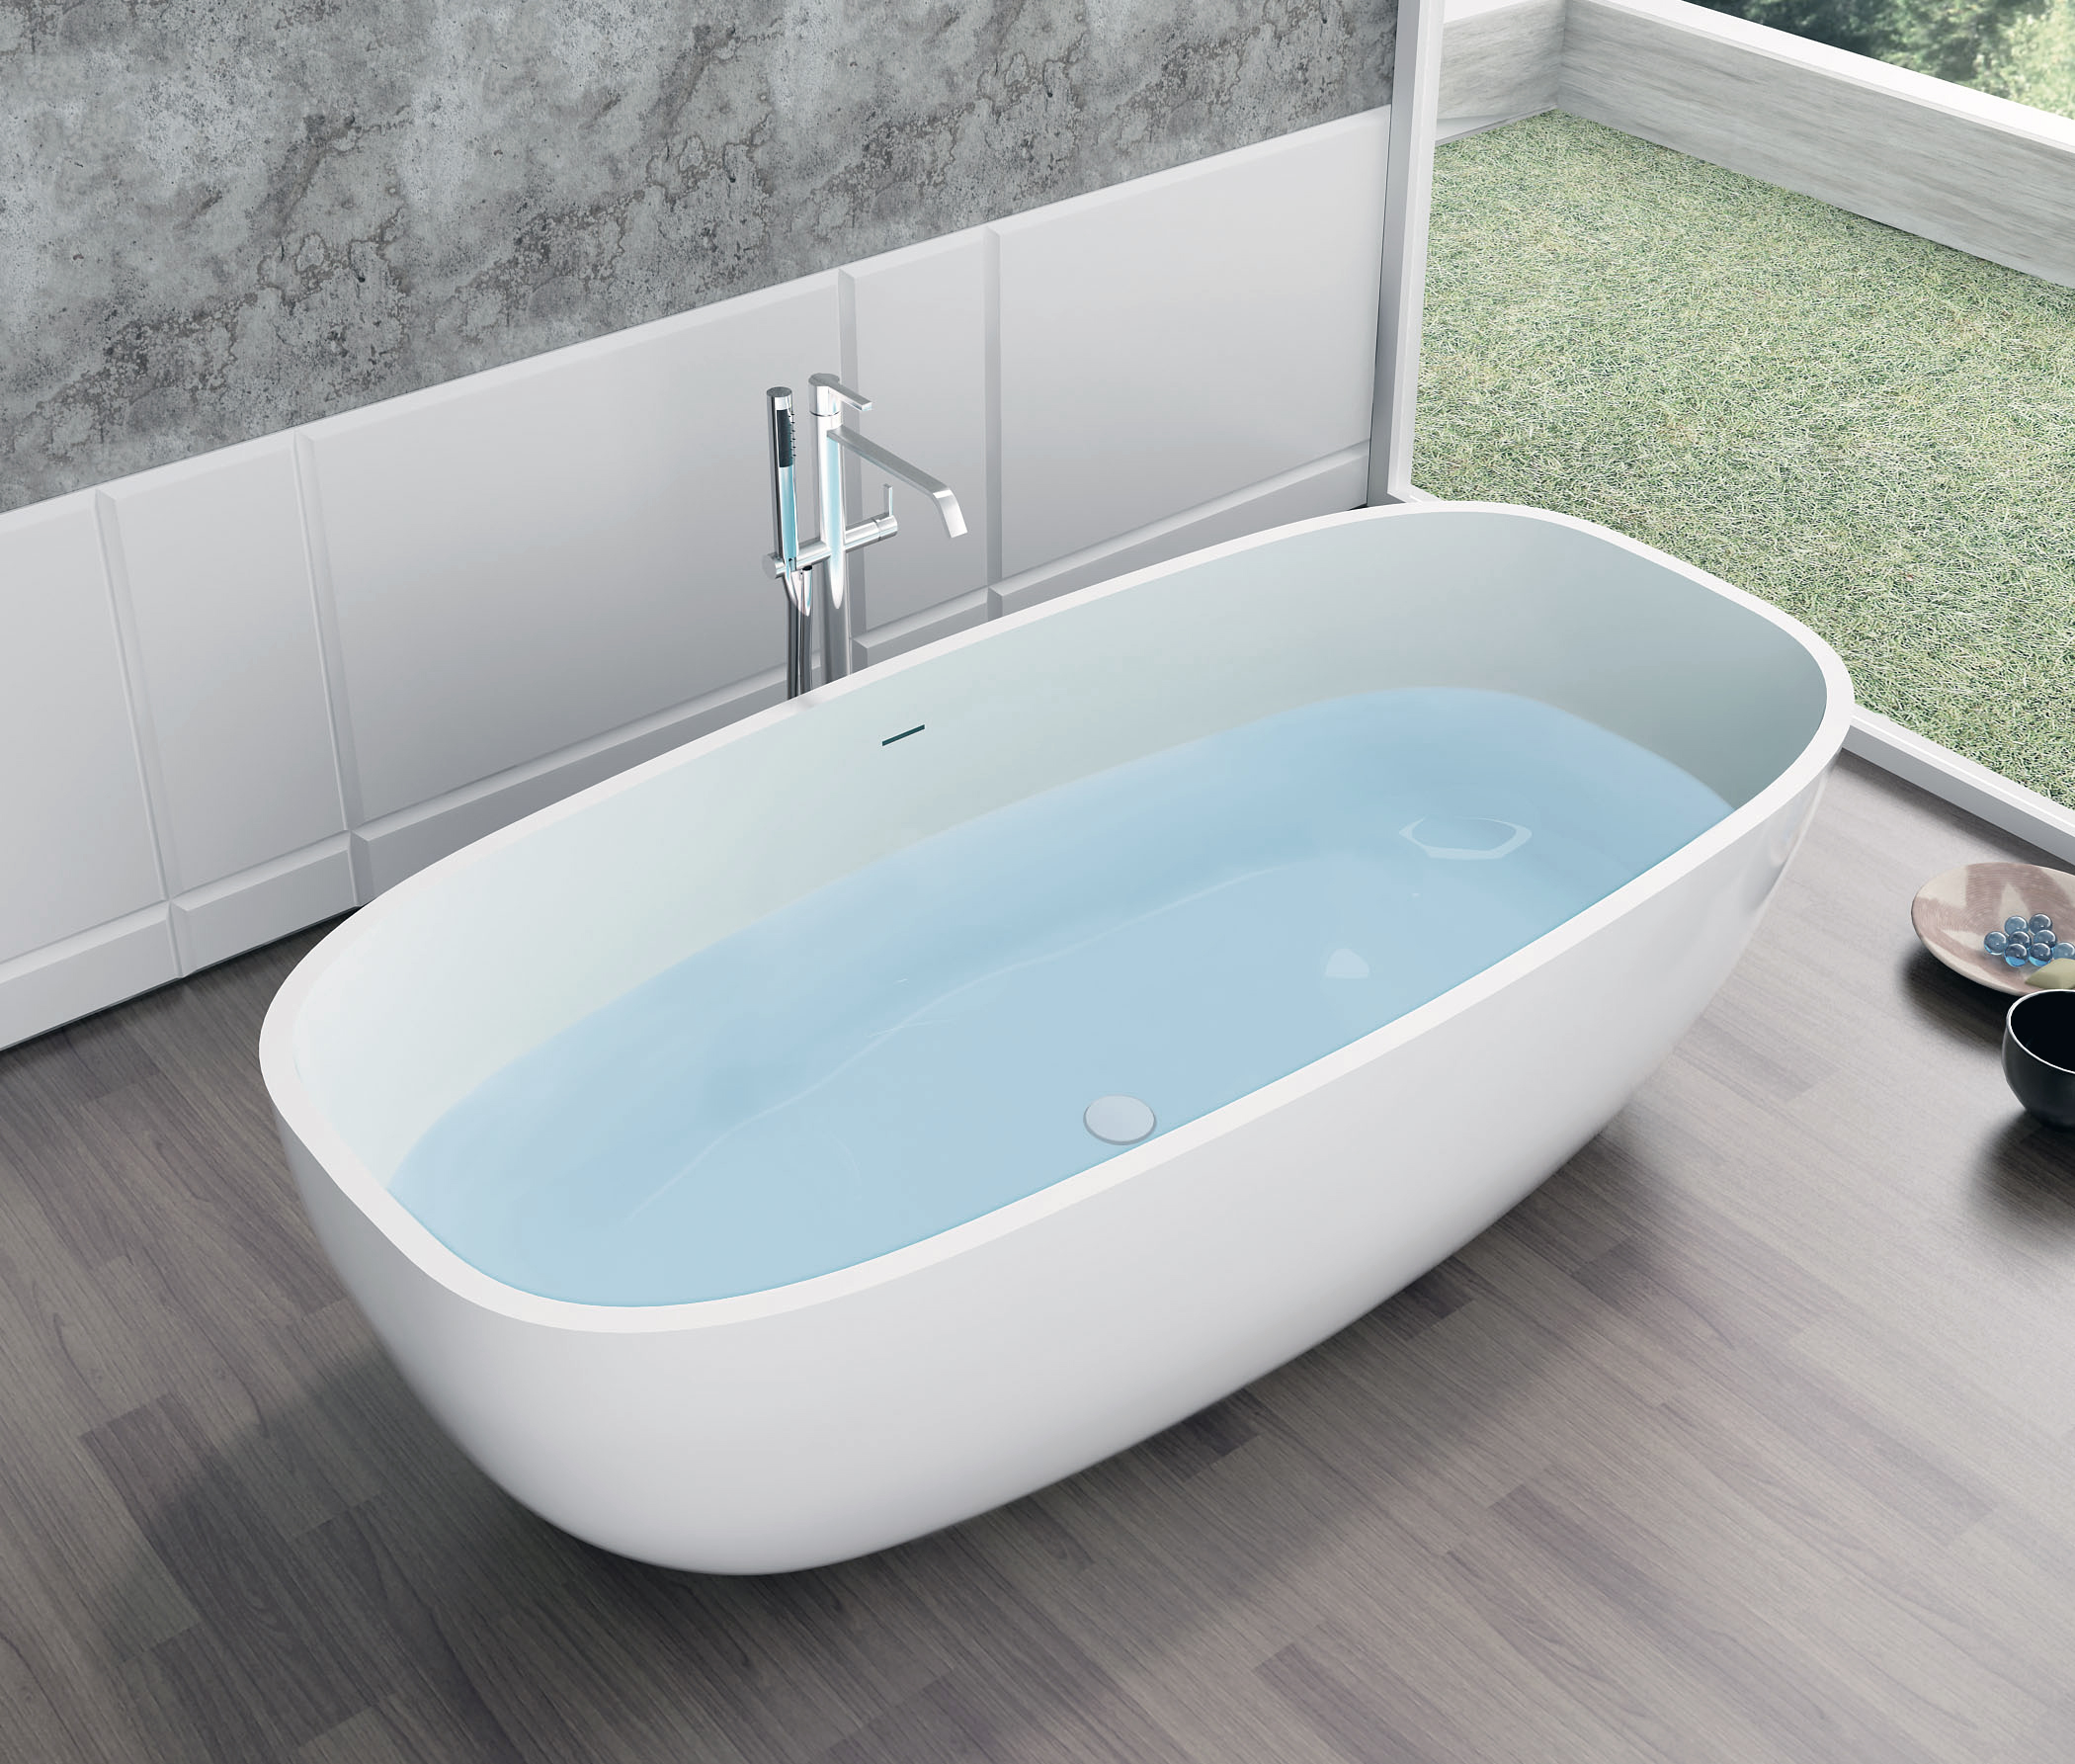 Vasca da bagno freestanding ocean solid stone scarico - Materiale vasca da bagno ...